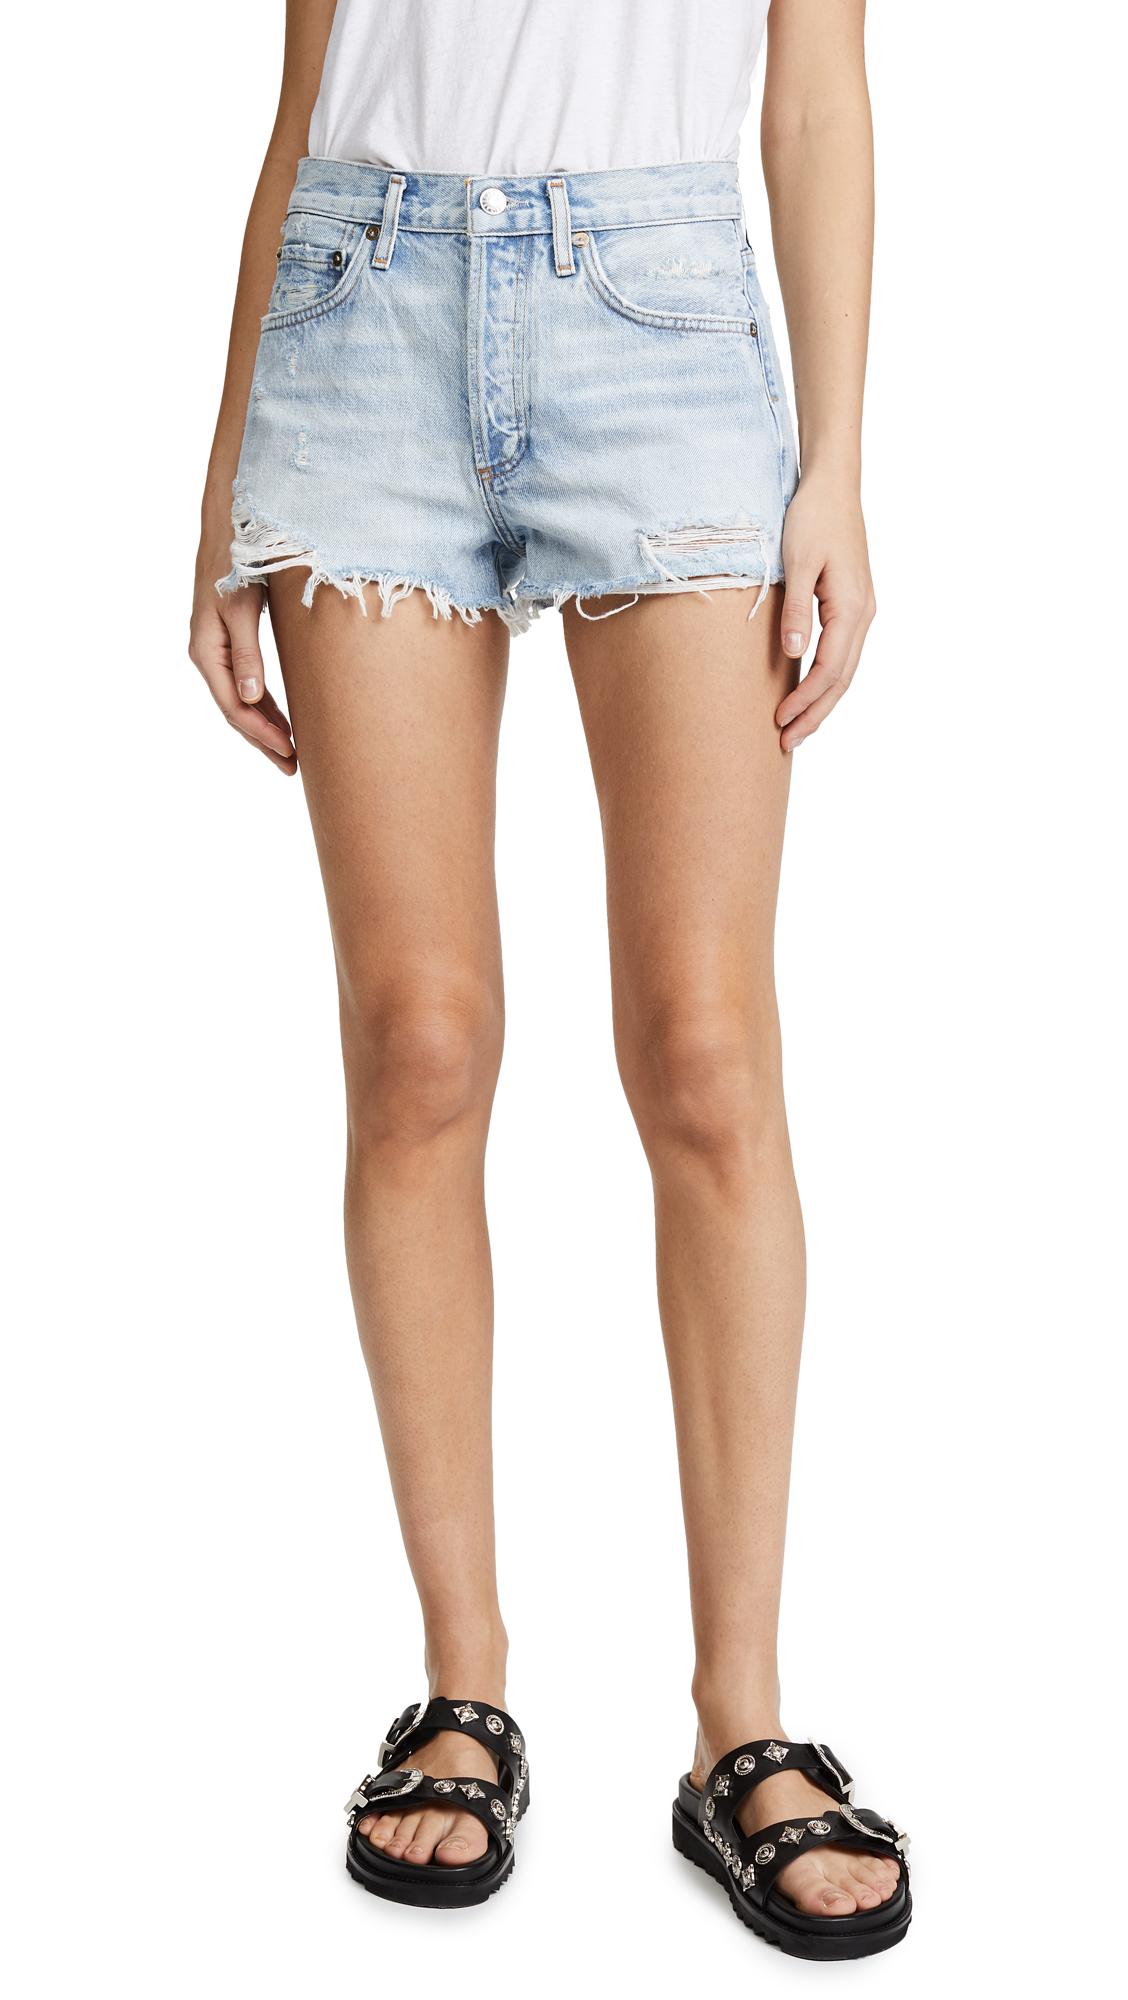 AGOLDE Parker Vintage Loose Fit Cutoff Shorts - Broken